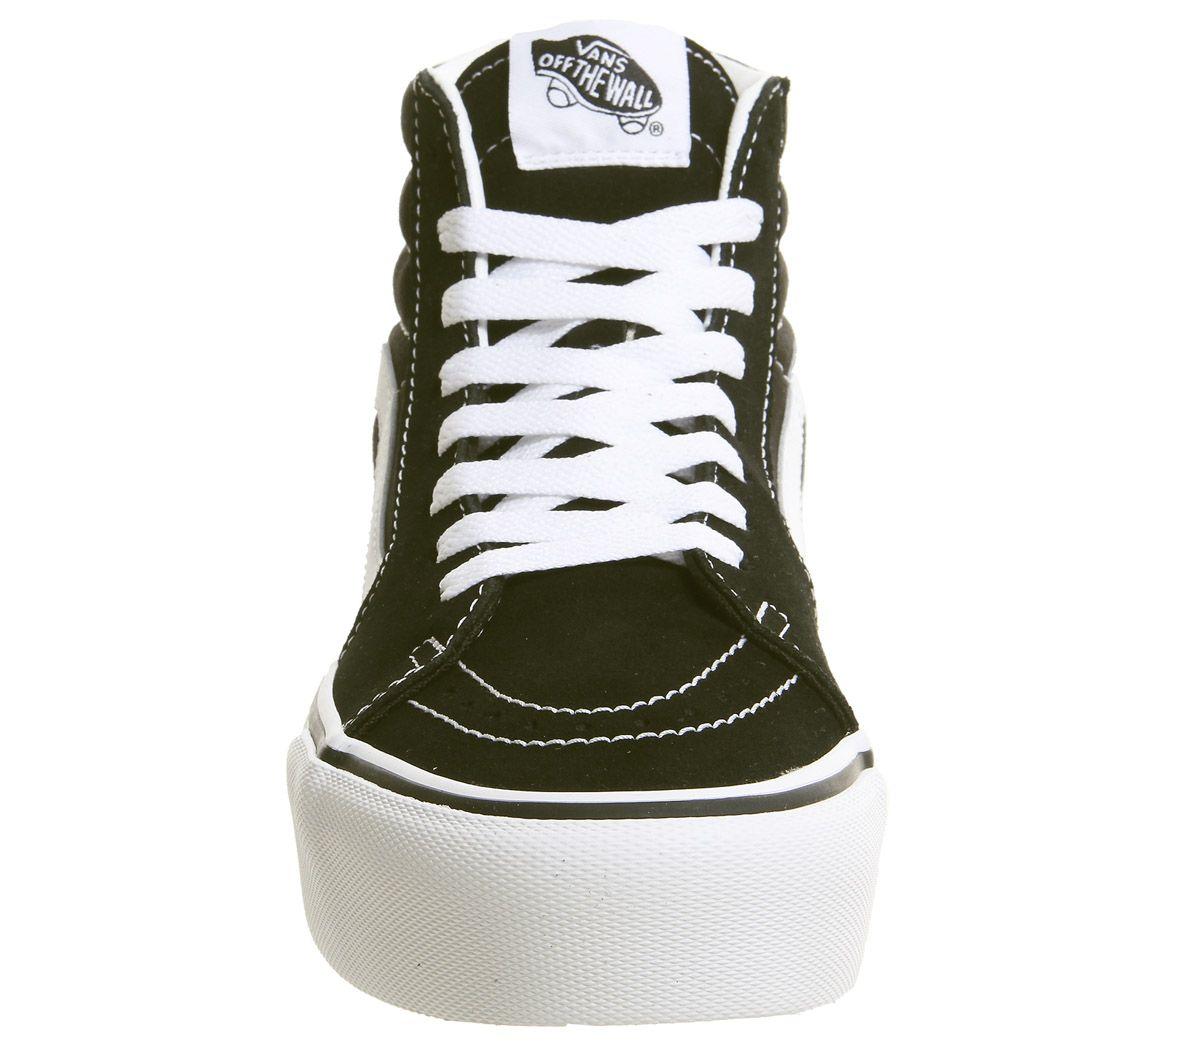 0383b85c54 Vans Sk8 Hi Platform 2.0 Trainers Black True White - Hers trainers